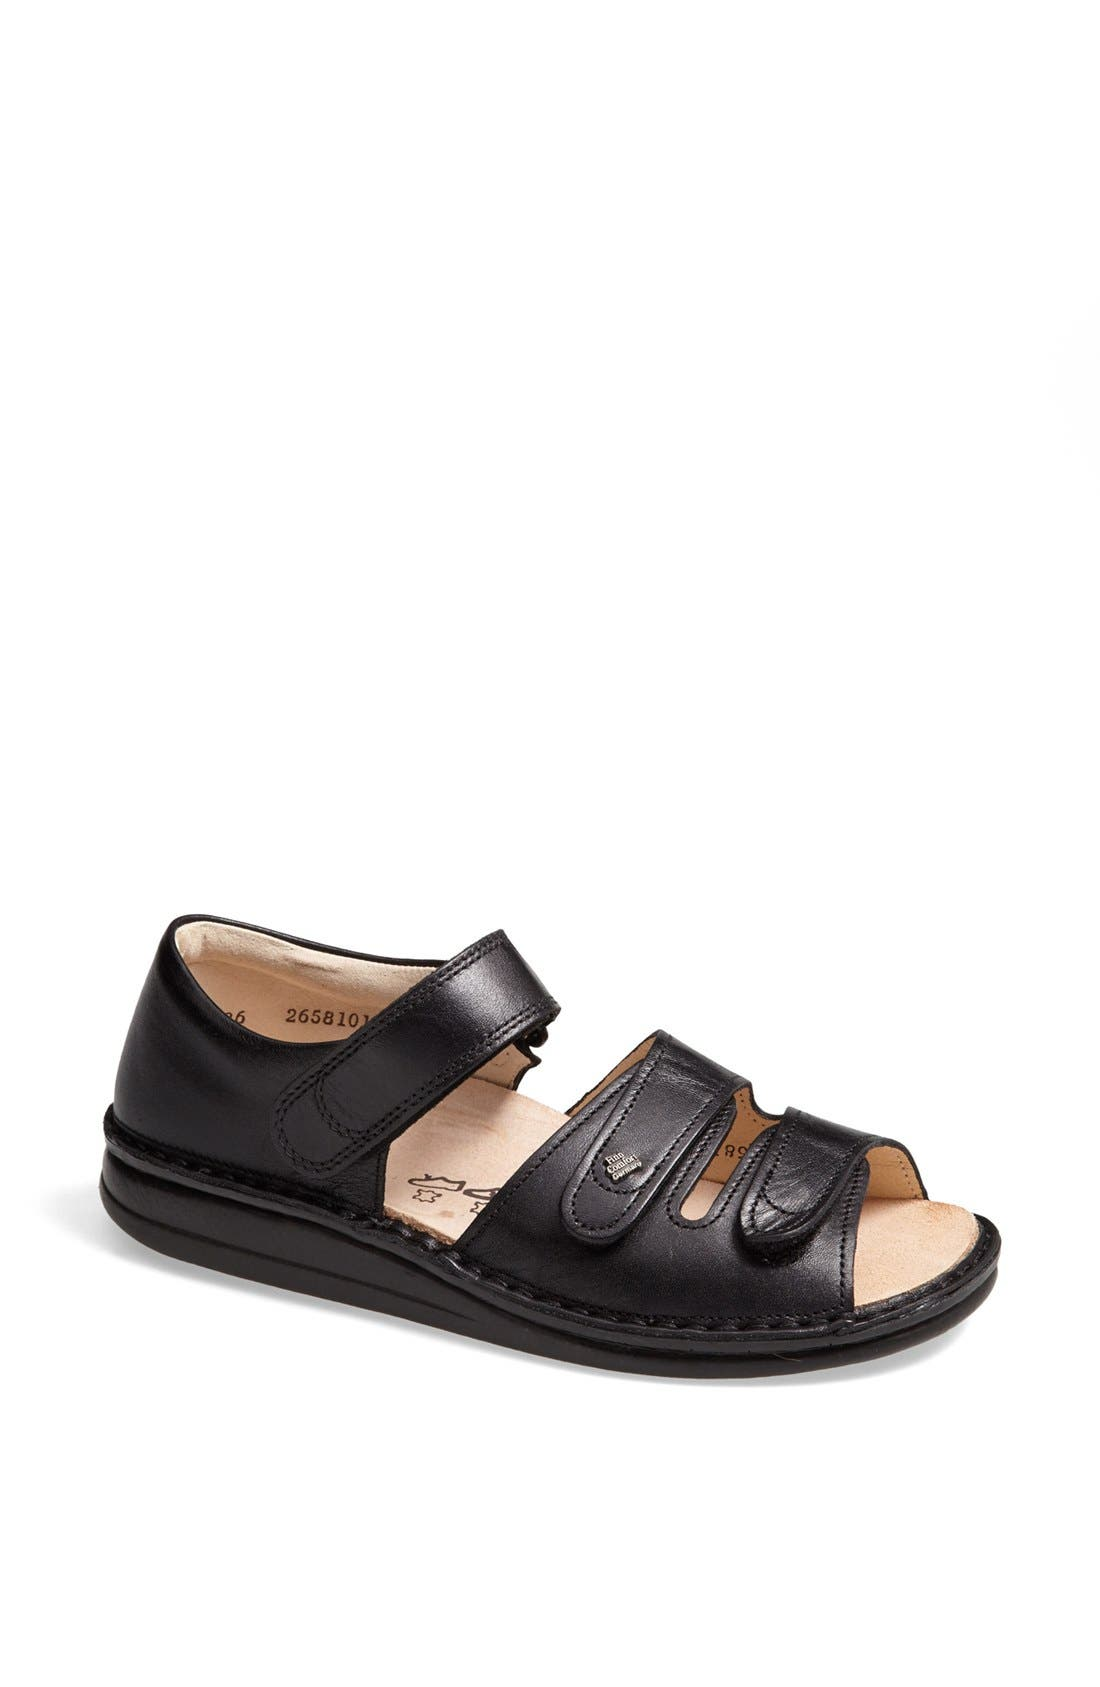 Alternate Image 1 Selected - Finn Comfort 'Baltrum 1518' Leather Sandal